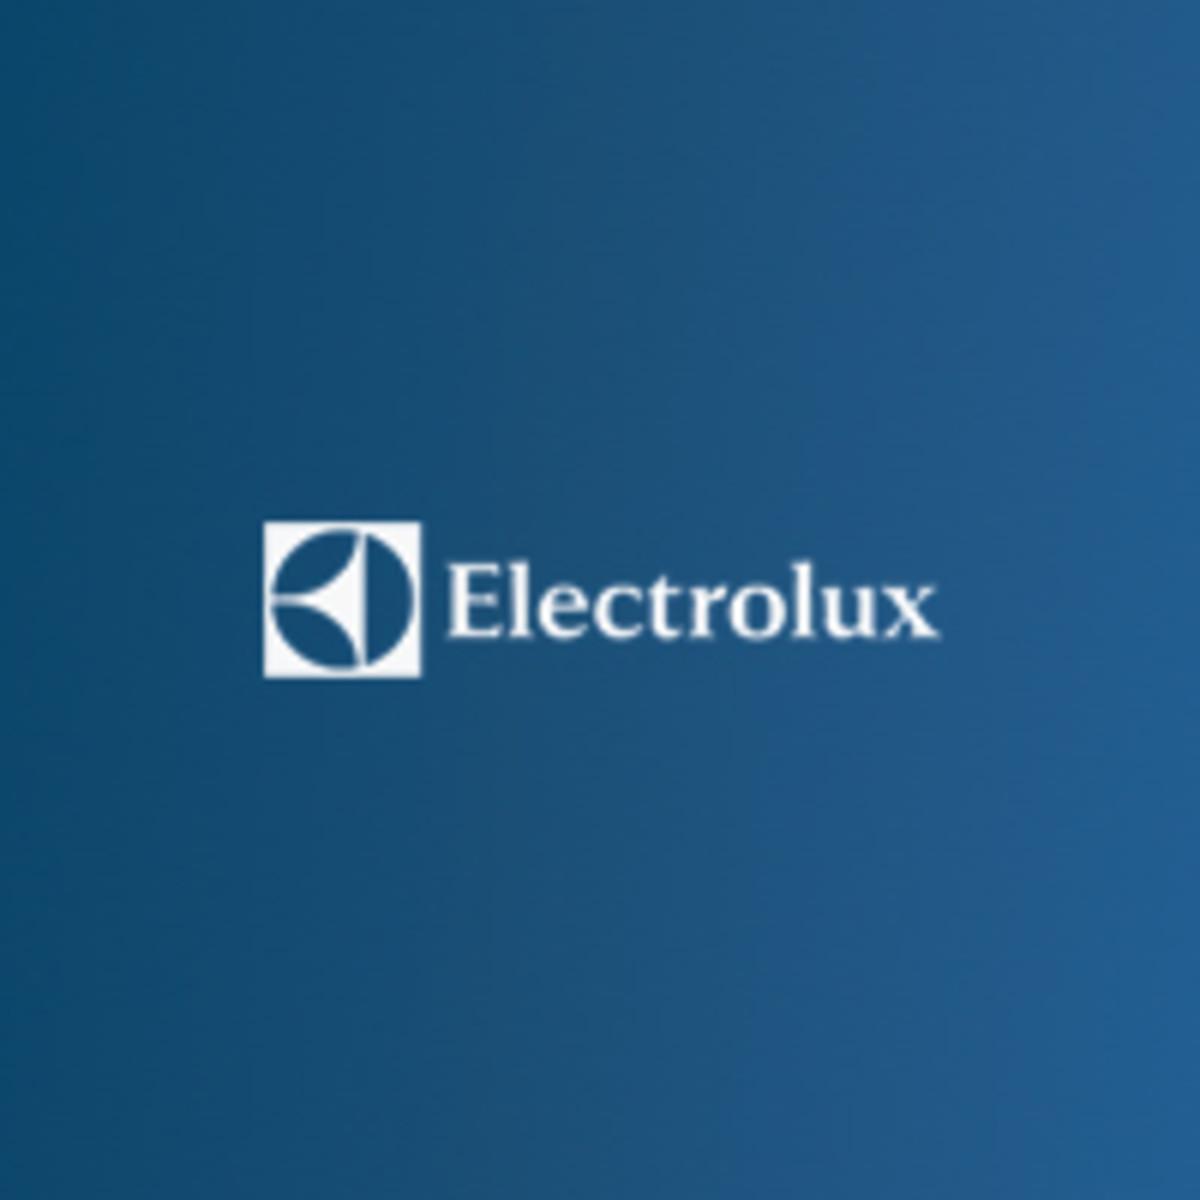 AuthorLogo_Electrolux (1)